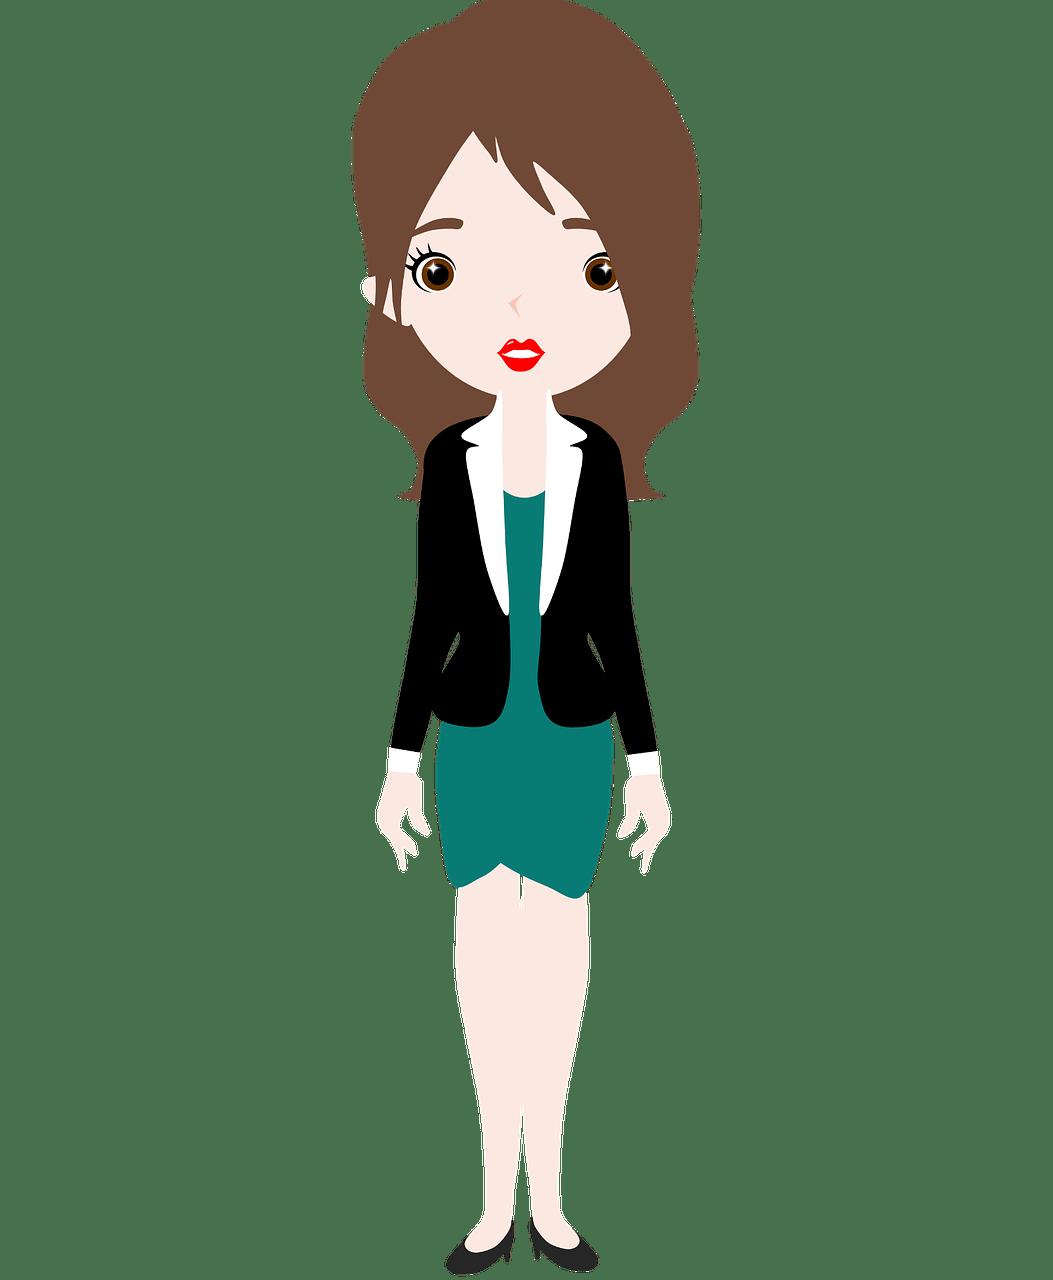 Employee clipart woman employee. High heels at work